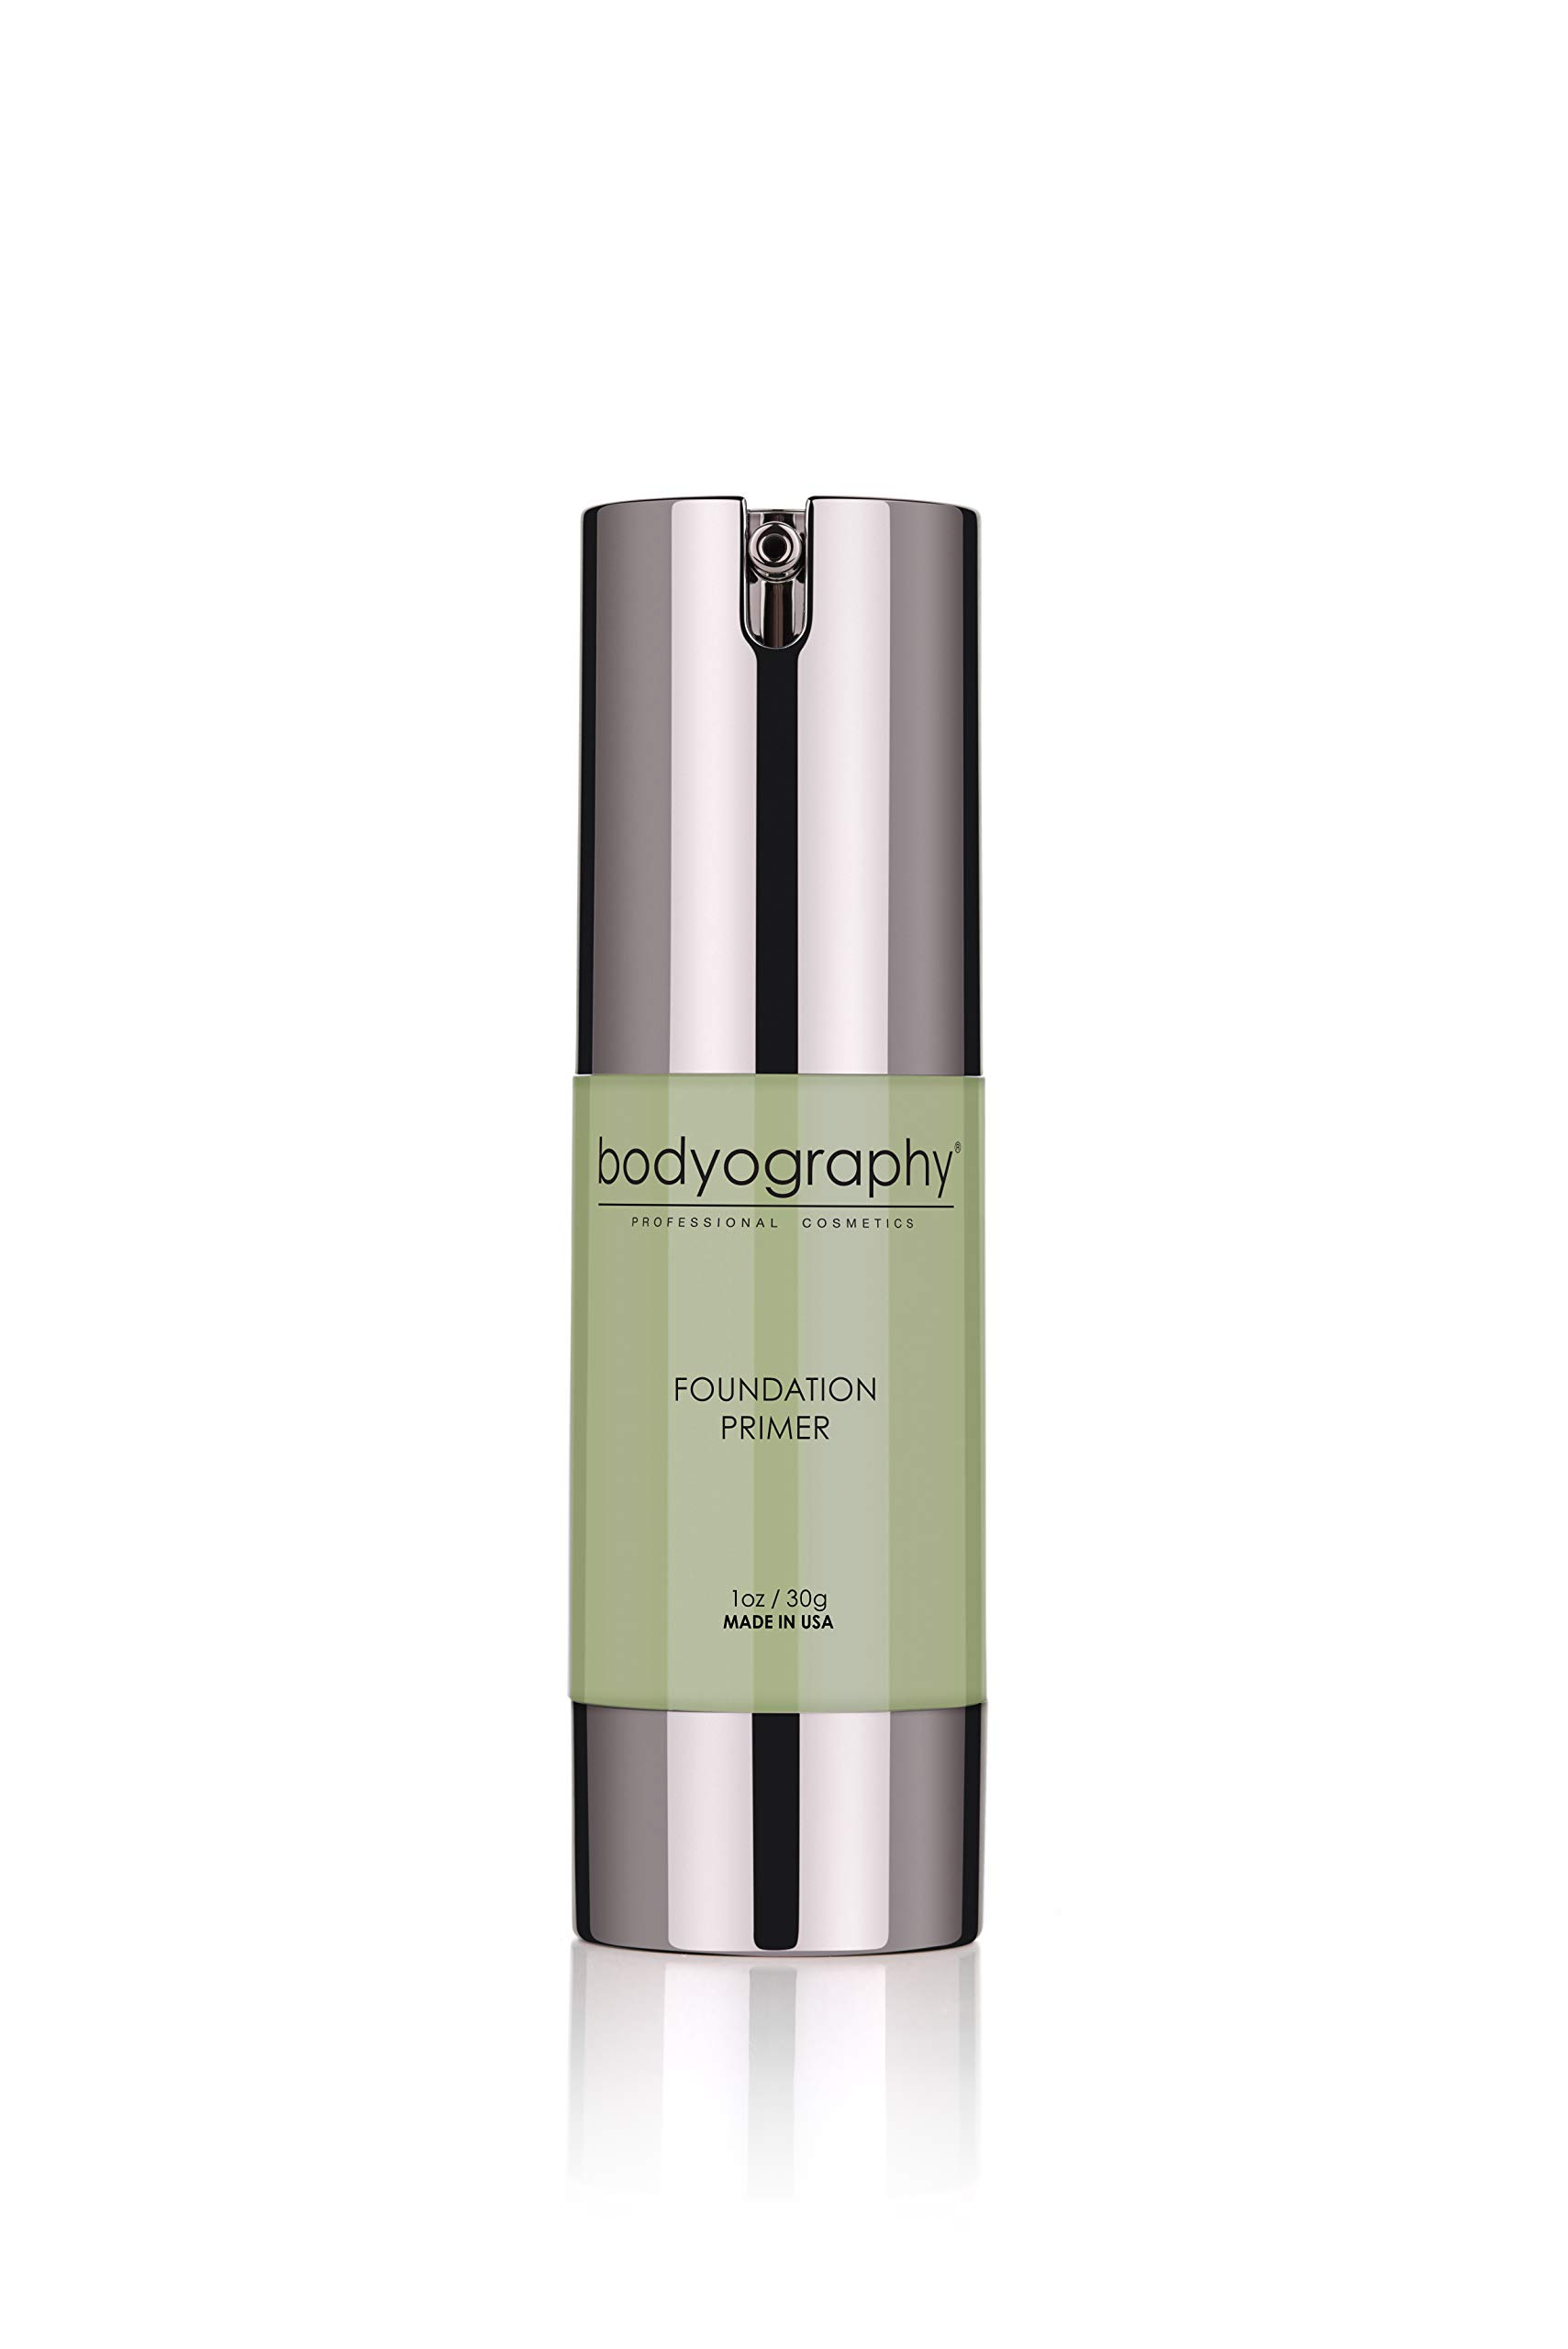 Bodyography Foundation Primer (Green): Clear-Drying Anti-Aging Salon Makeup Primer w/ Vitamin E, A, Jojoba, Grapeseed Oil | Minimize Rosacea, Redness | Gluten-Free, Cruelty-Free